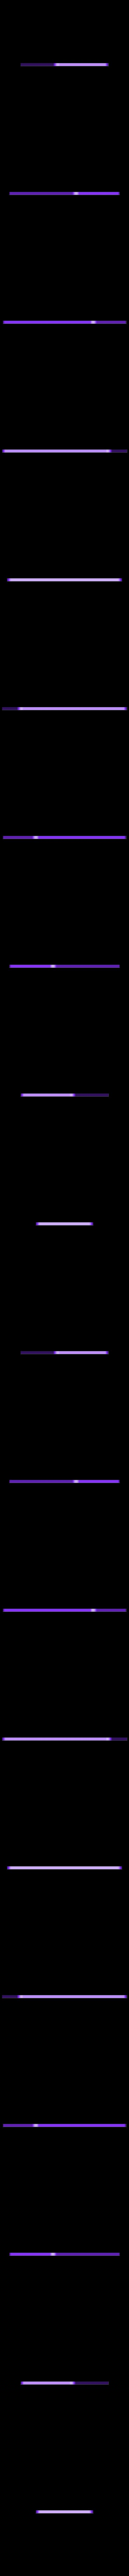 Corps3.stl Télécharger fichier STL Support Batterie Xiaomi M365 /Holder Battery Xiaomi • Objet imprimable en 3D, Spelth